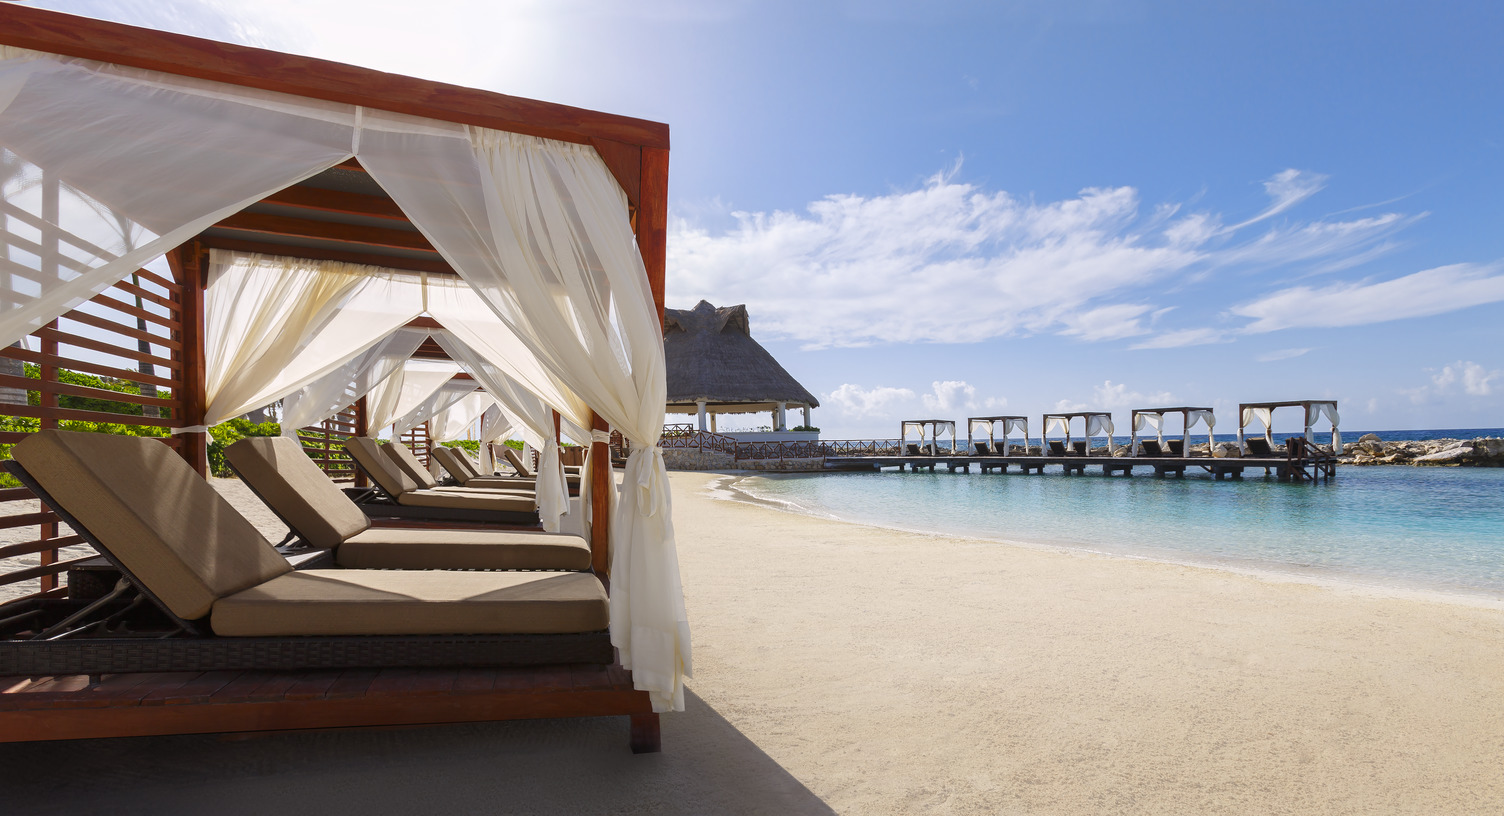 Travel Agency All-Inclusive Resort Heaven at Hard Rock Hotel Riviera Maya 14